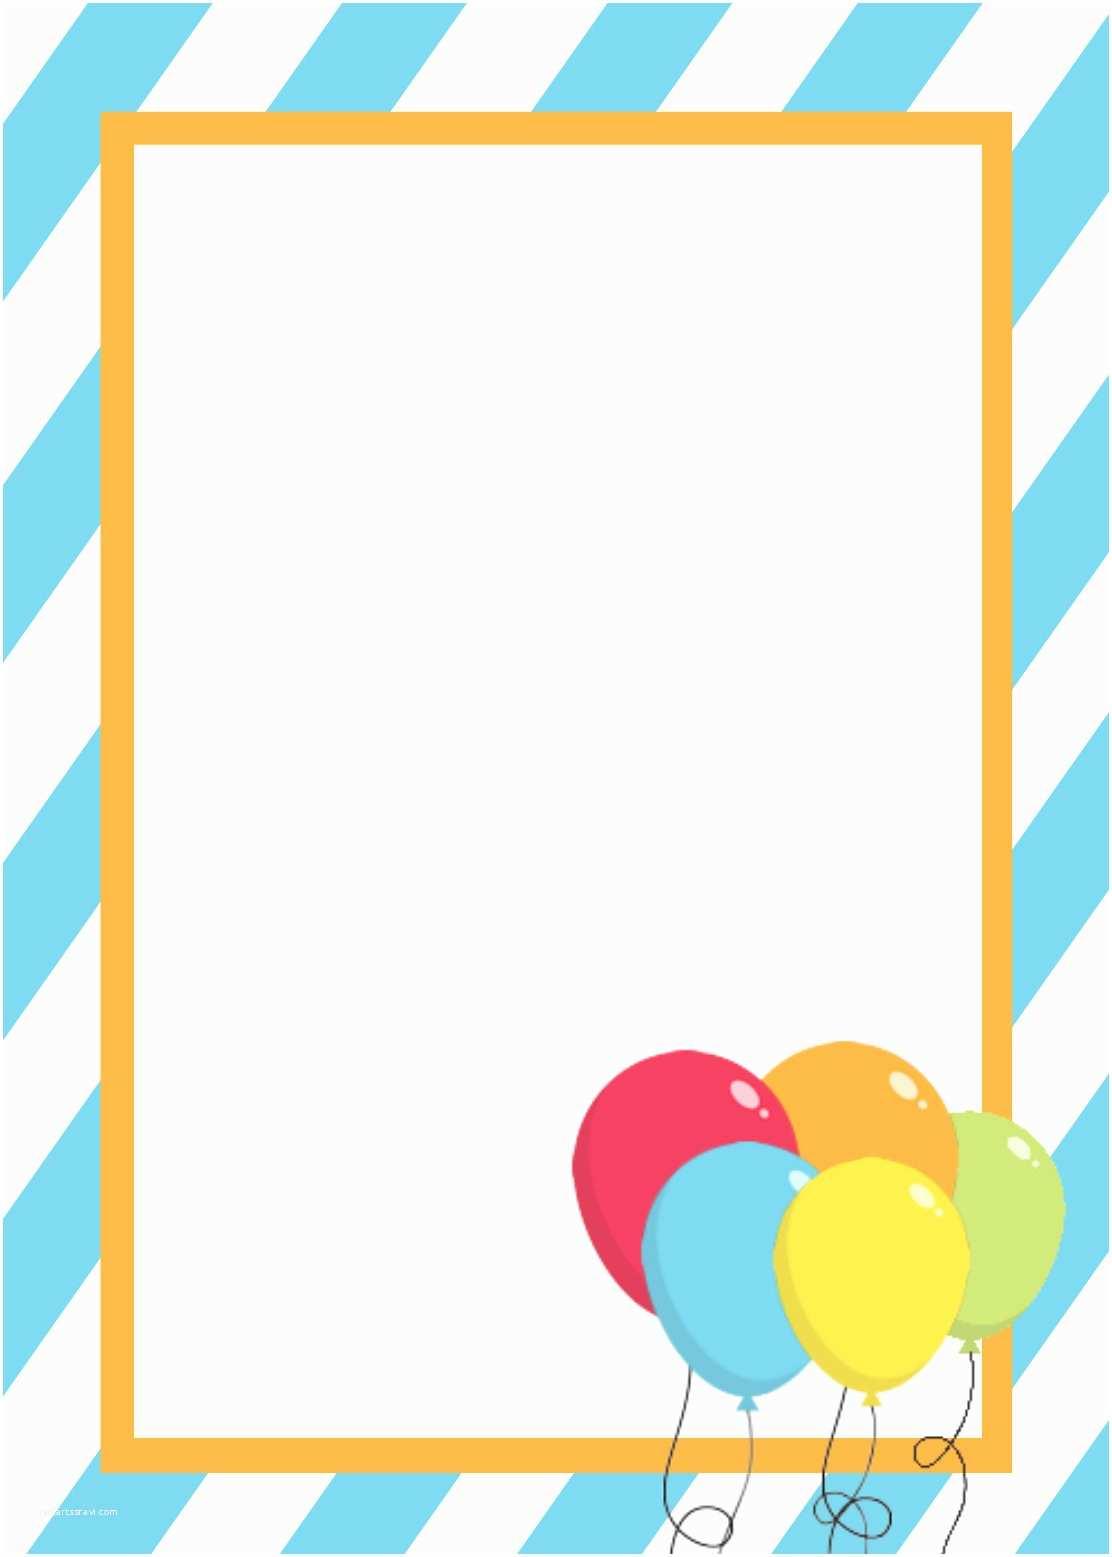 Free Birthday Invitations Templates Free Printable Birthday Invitation Templates